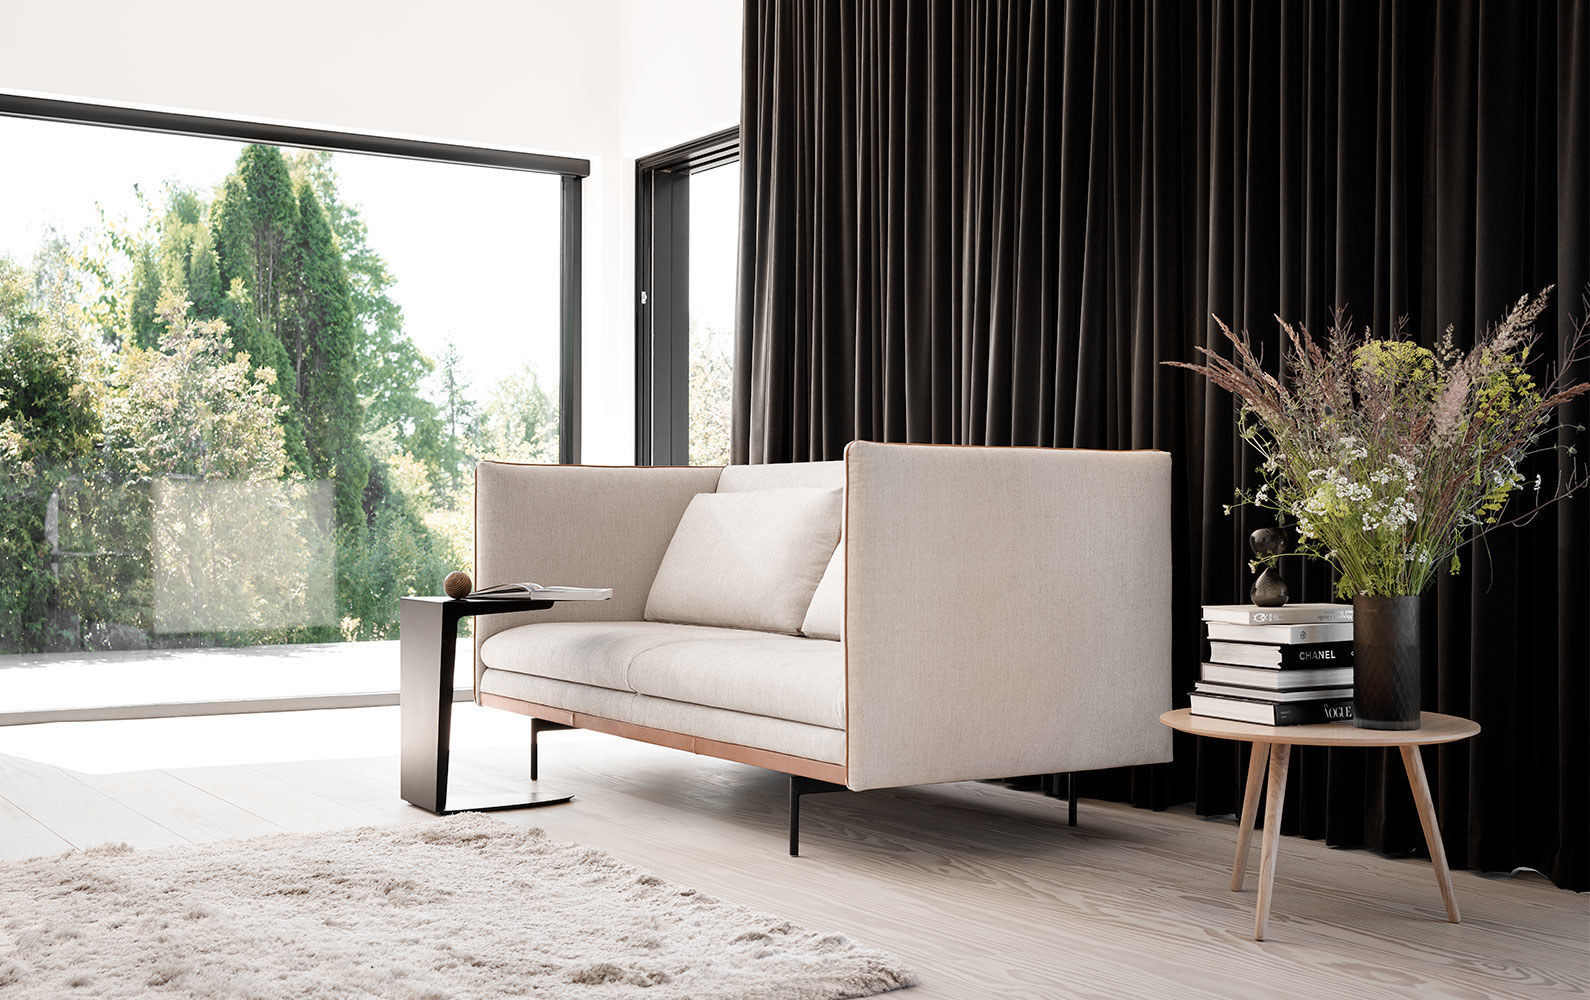 2 seater sofas - Nantes sofa with cushions